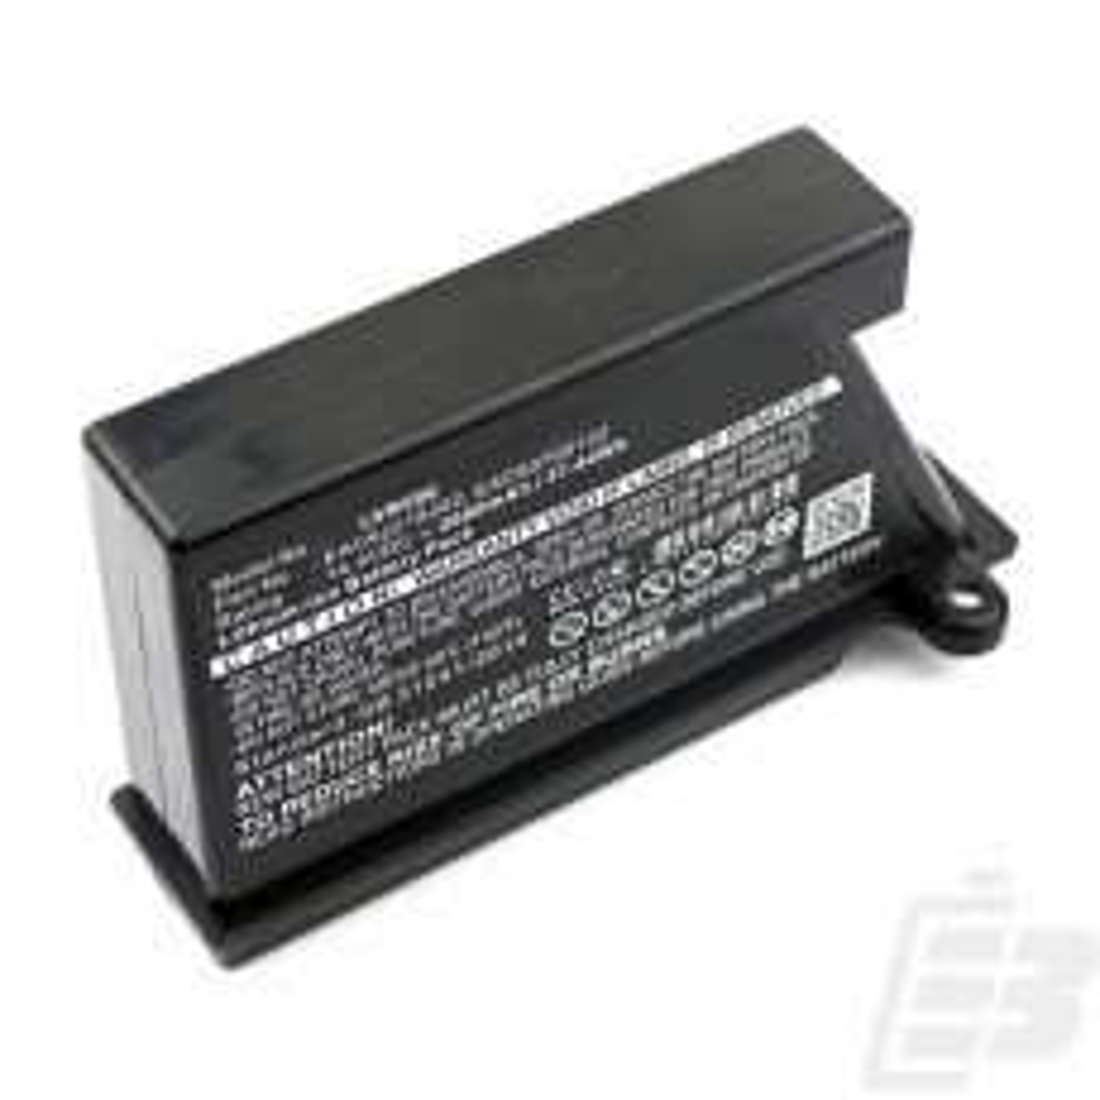 Vacuum cleaner battery LG HomBot VR64703LVMB_1